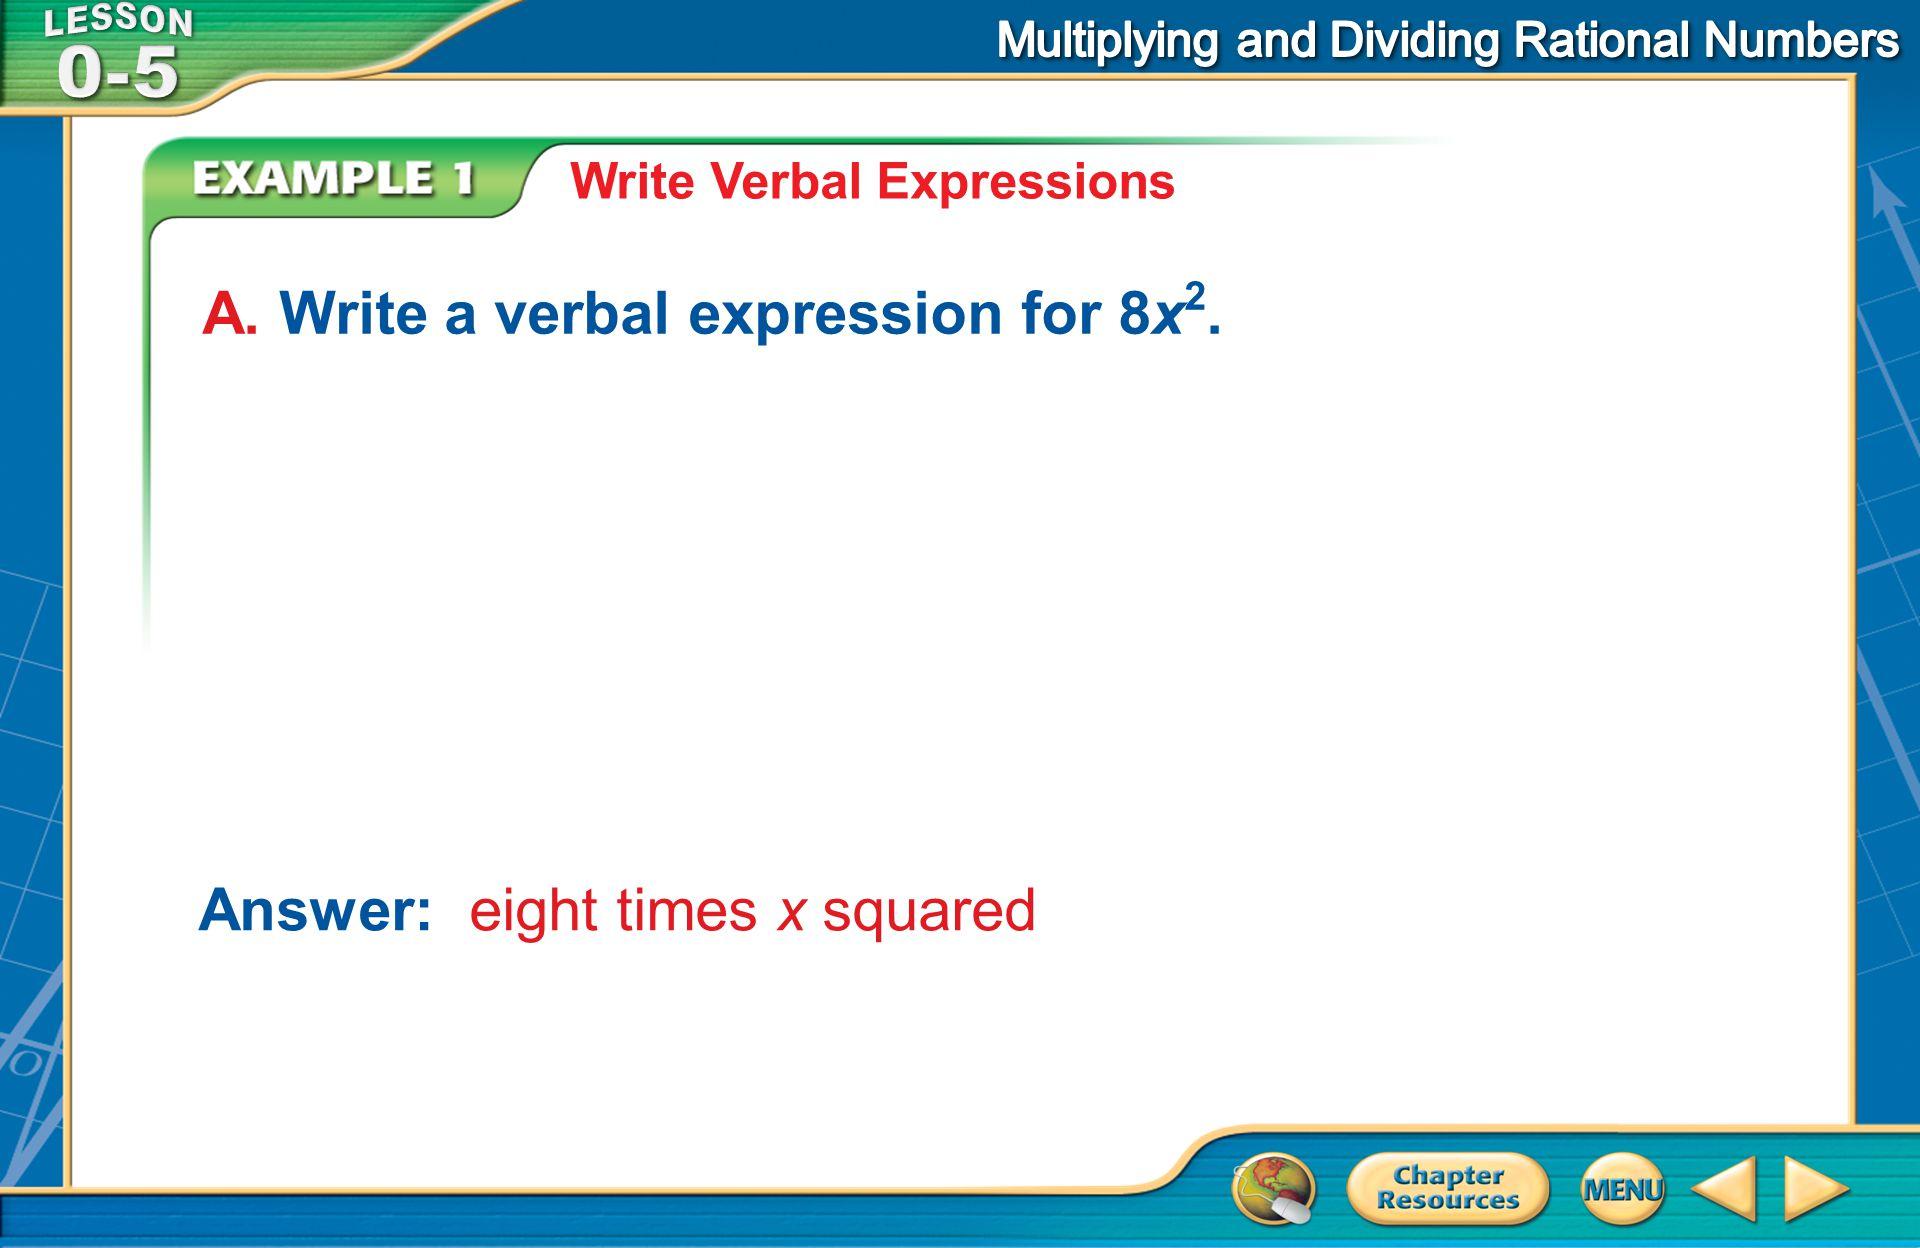 [Enter question here] A.6 – 4x B.(6 – 4)x C.6 + 4x D.6x – 4 B.